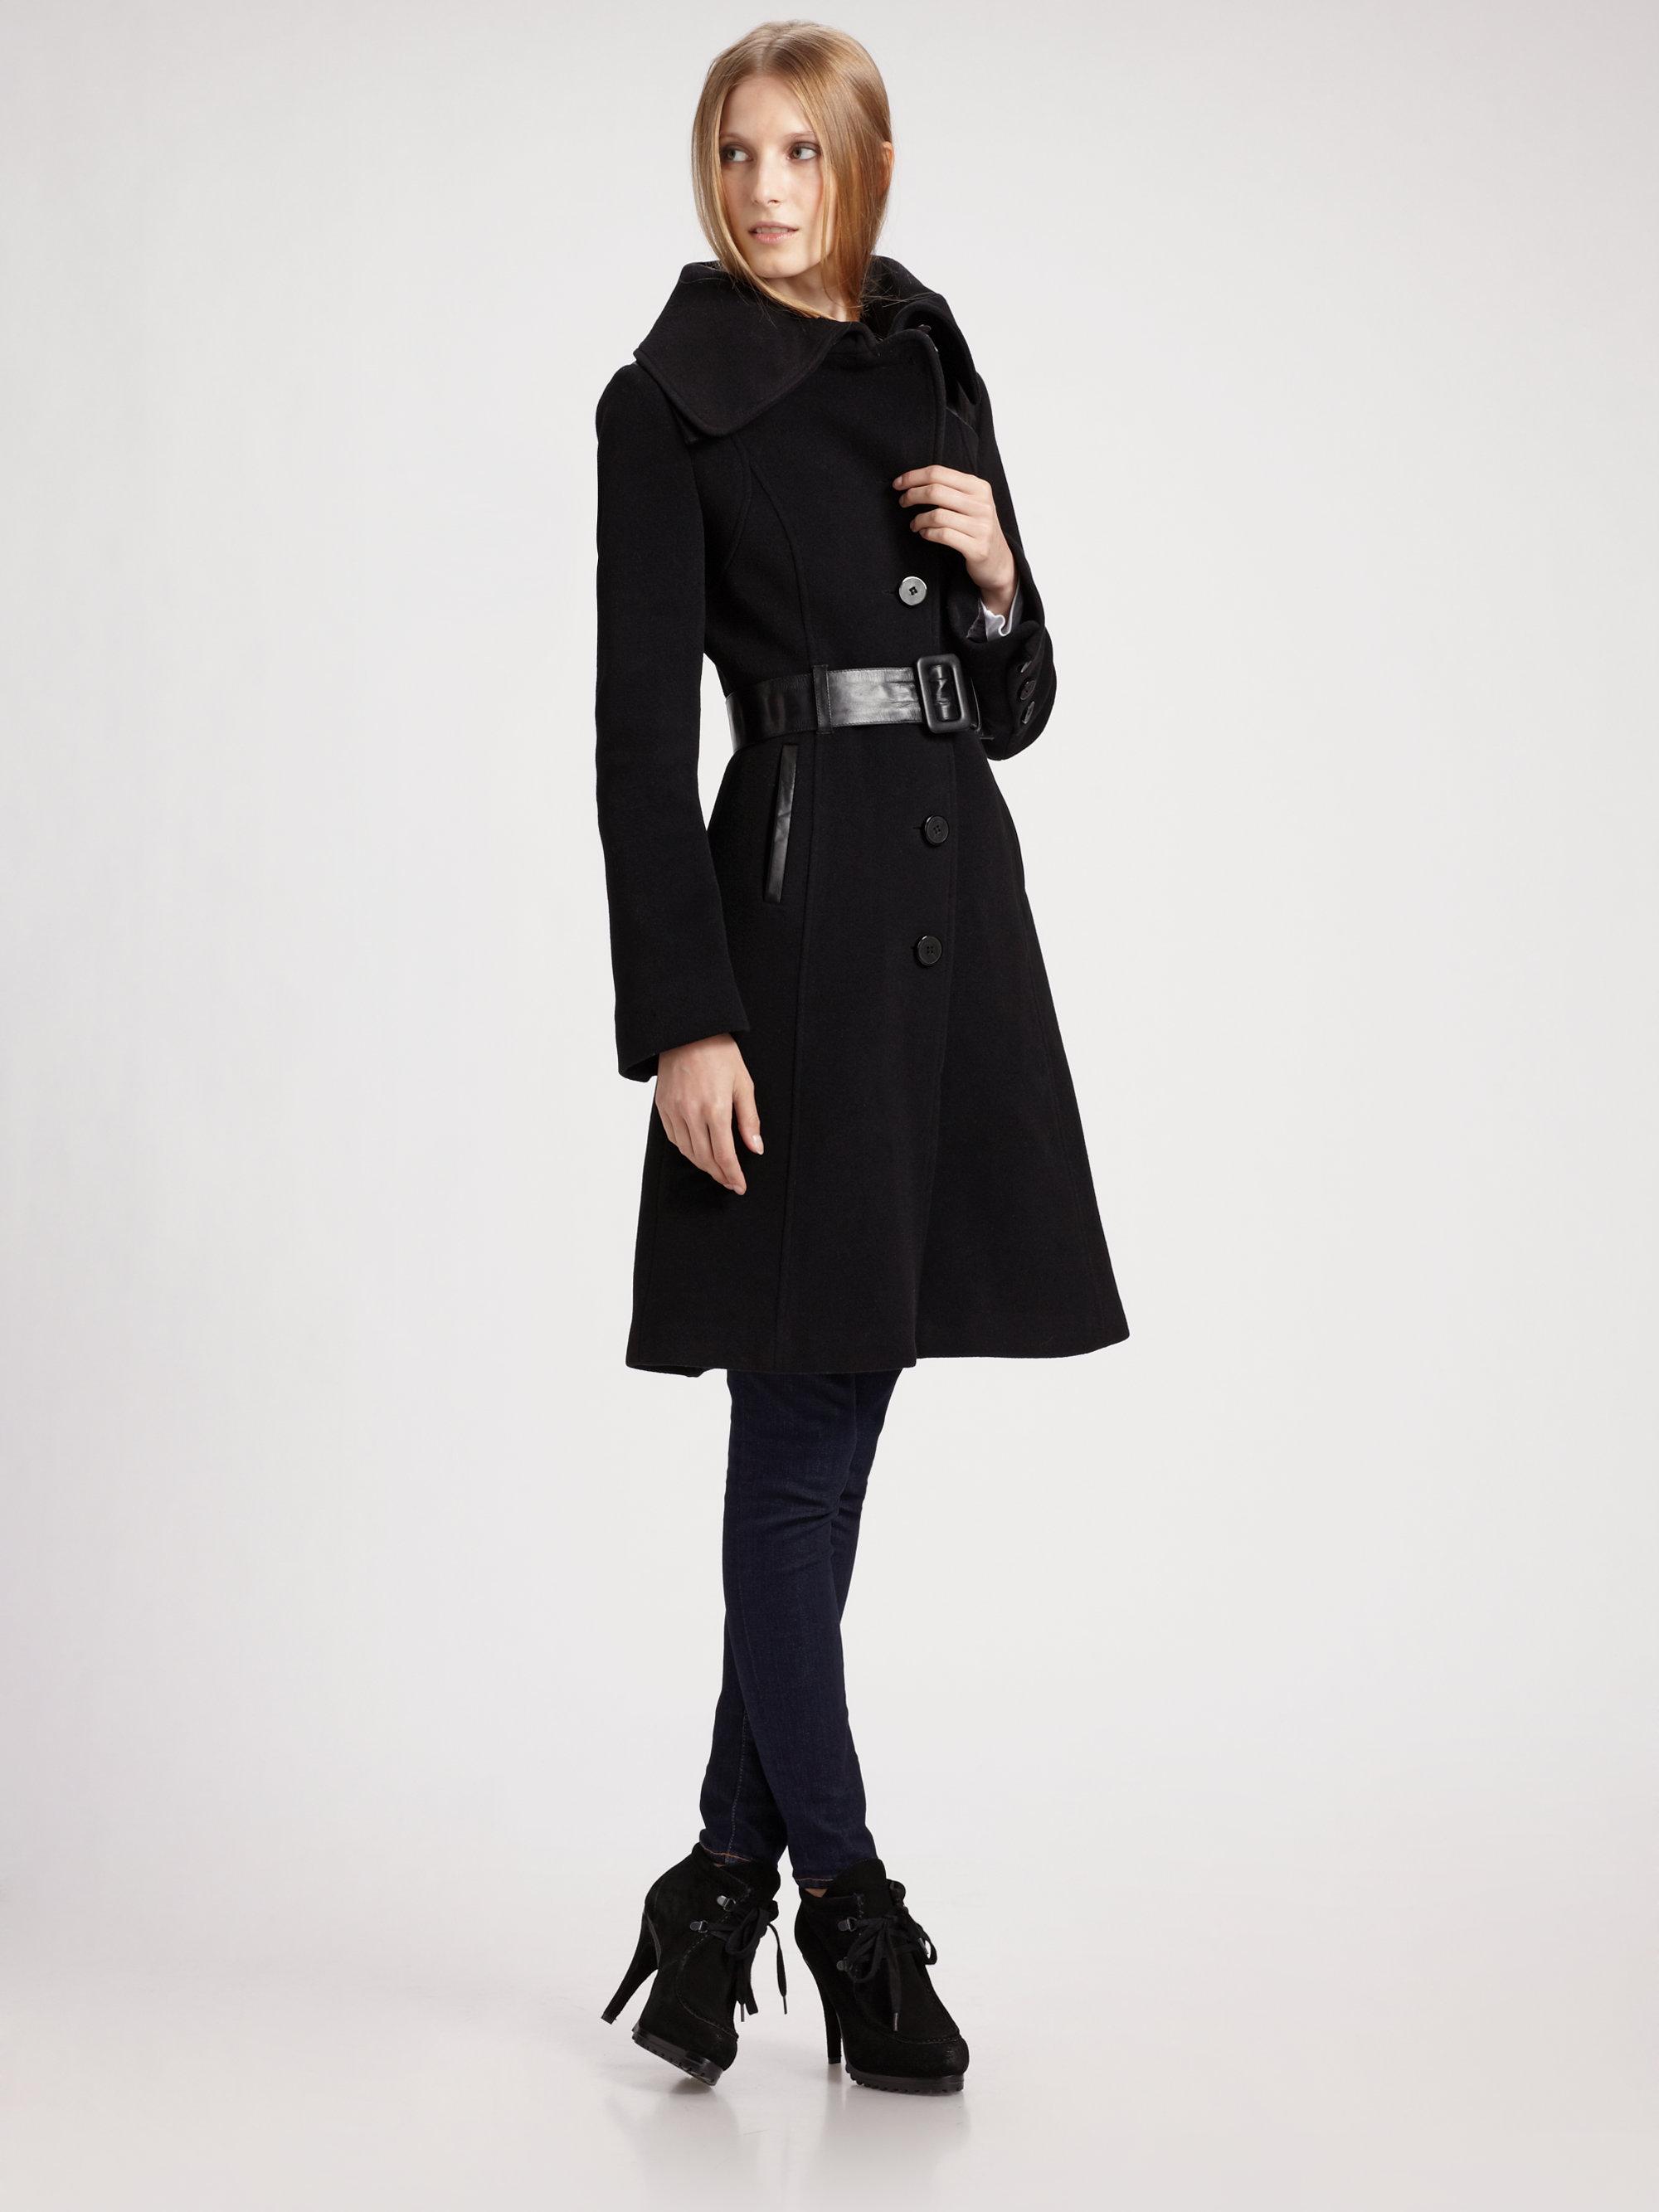 cab90a7a703 ... authentic lyst mackage aline wool coat in black 3dfda 5b0f1